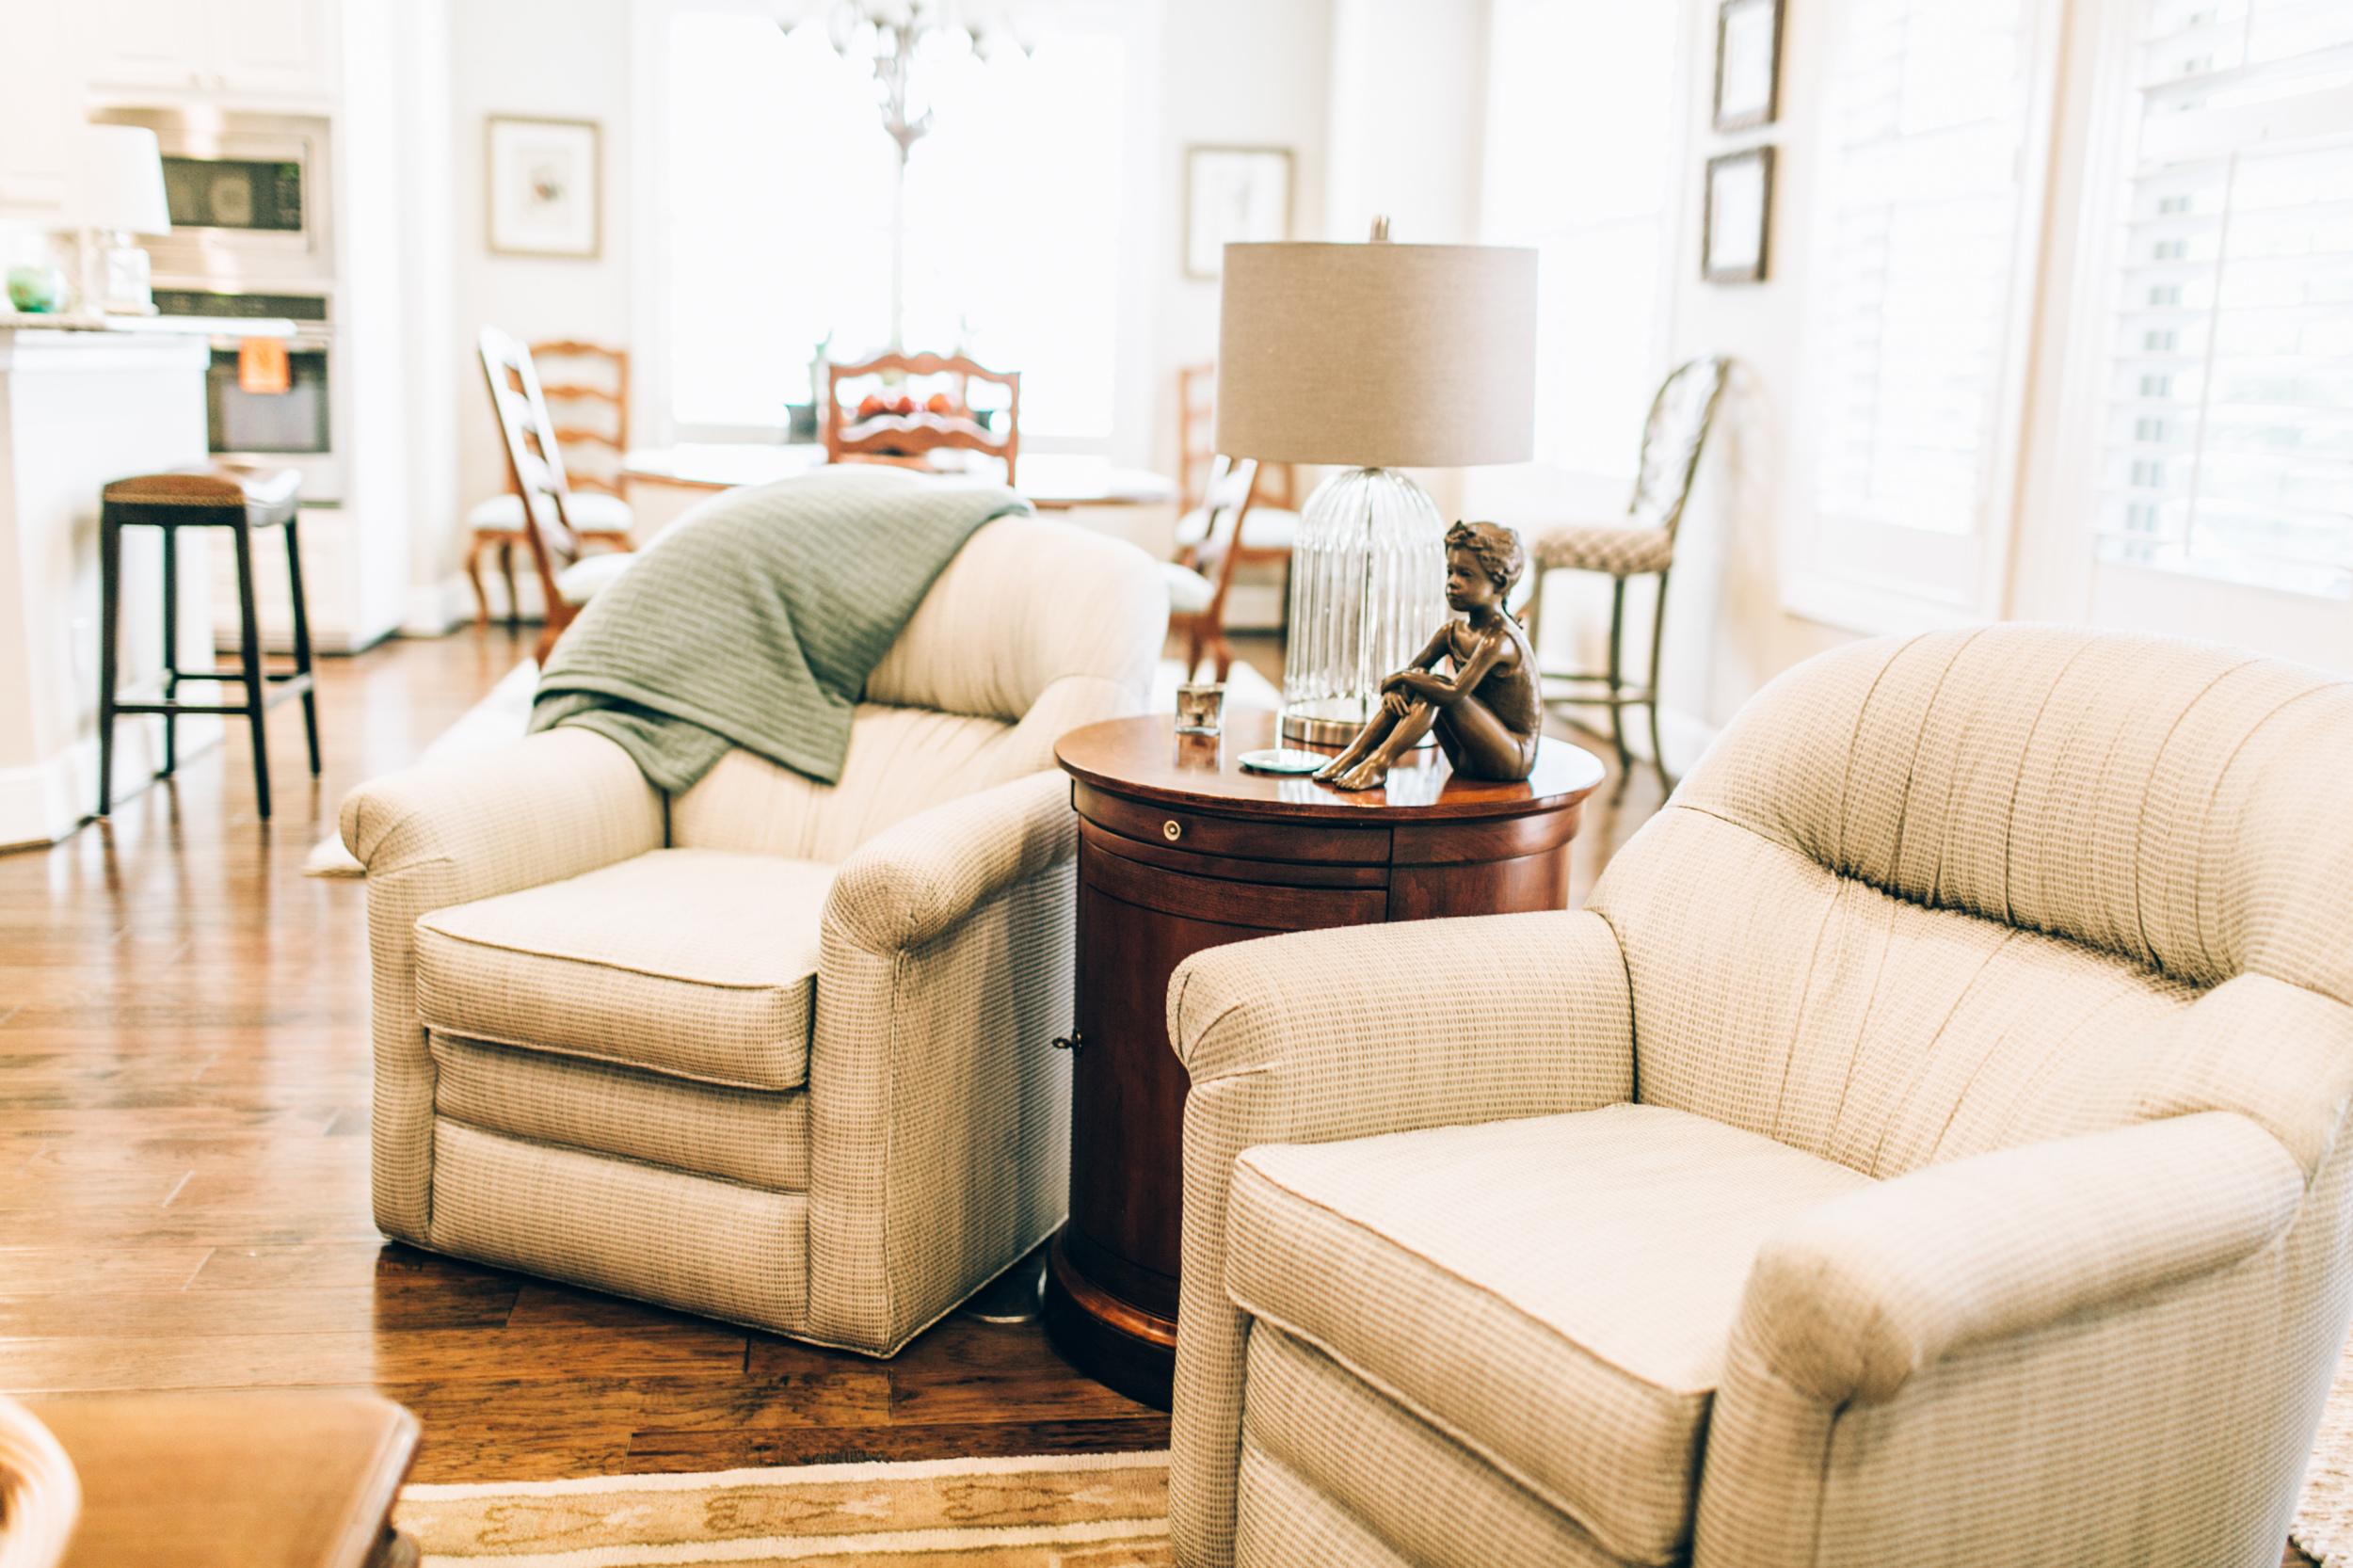 interior-design-home-decorating-341.jpg